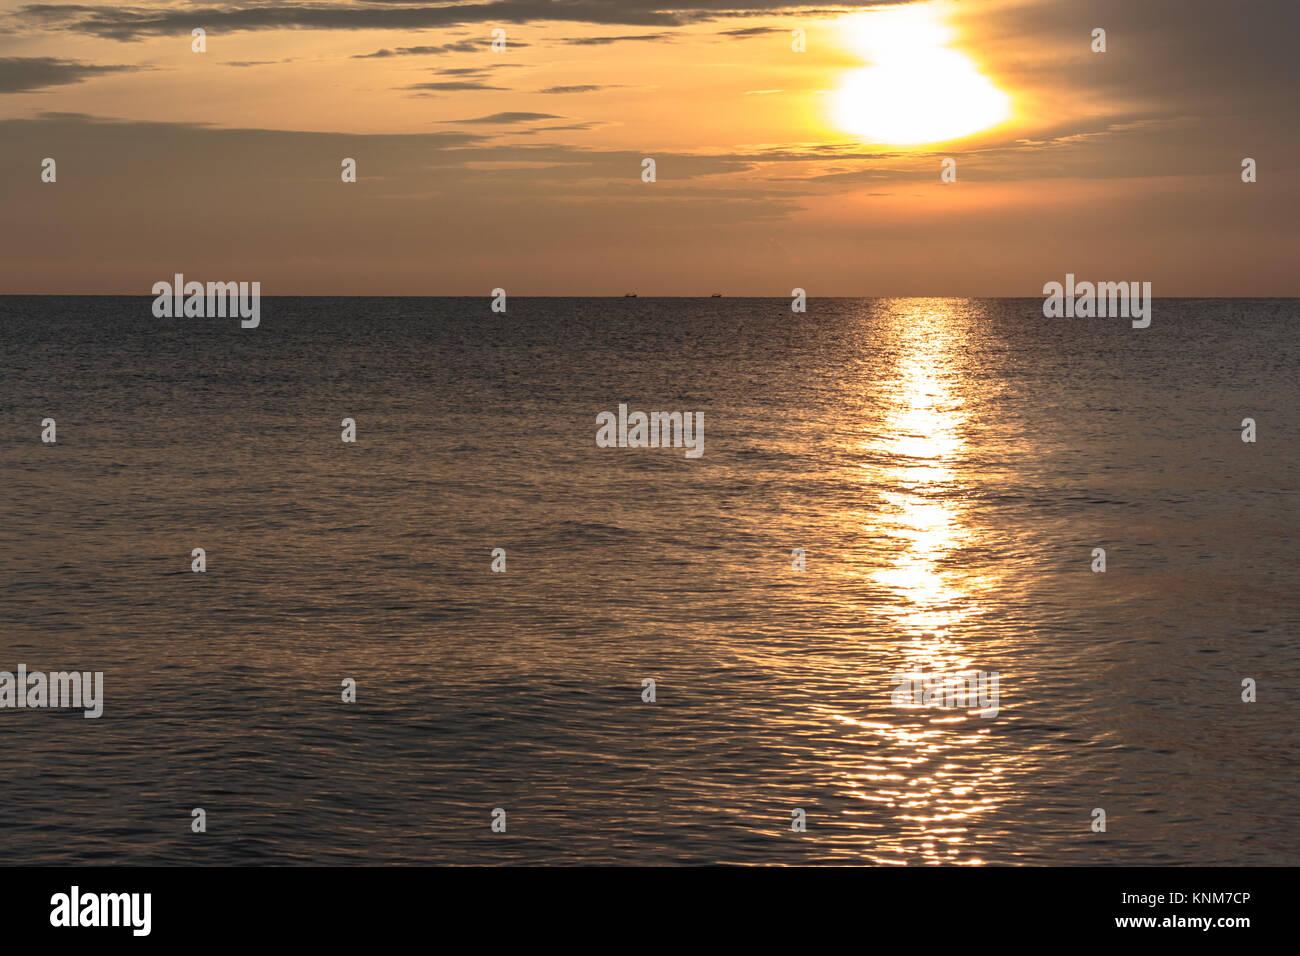 Good morning Sunrise Landscape from Songkhla Sea, Thailand - Stock Image